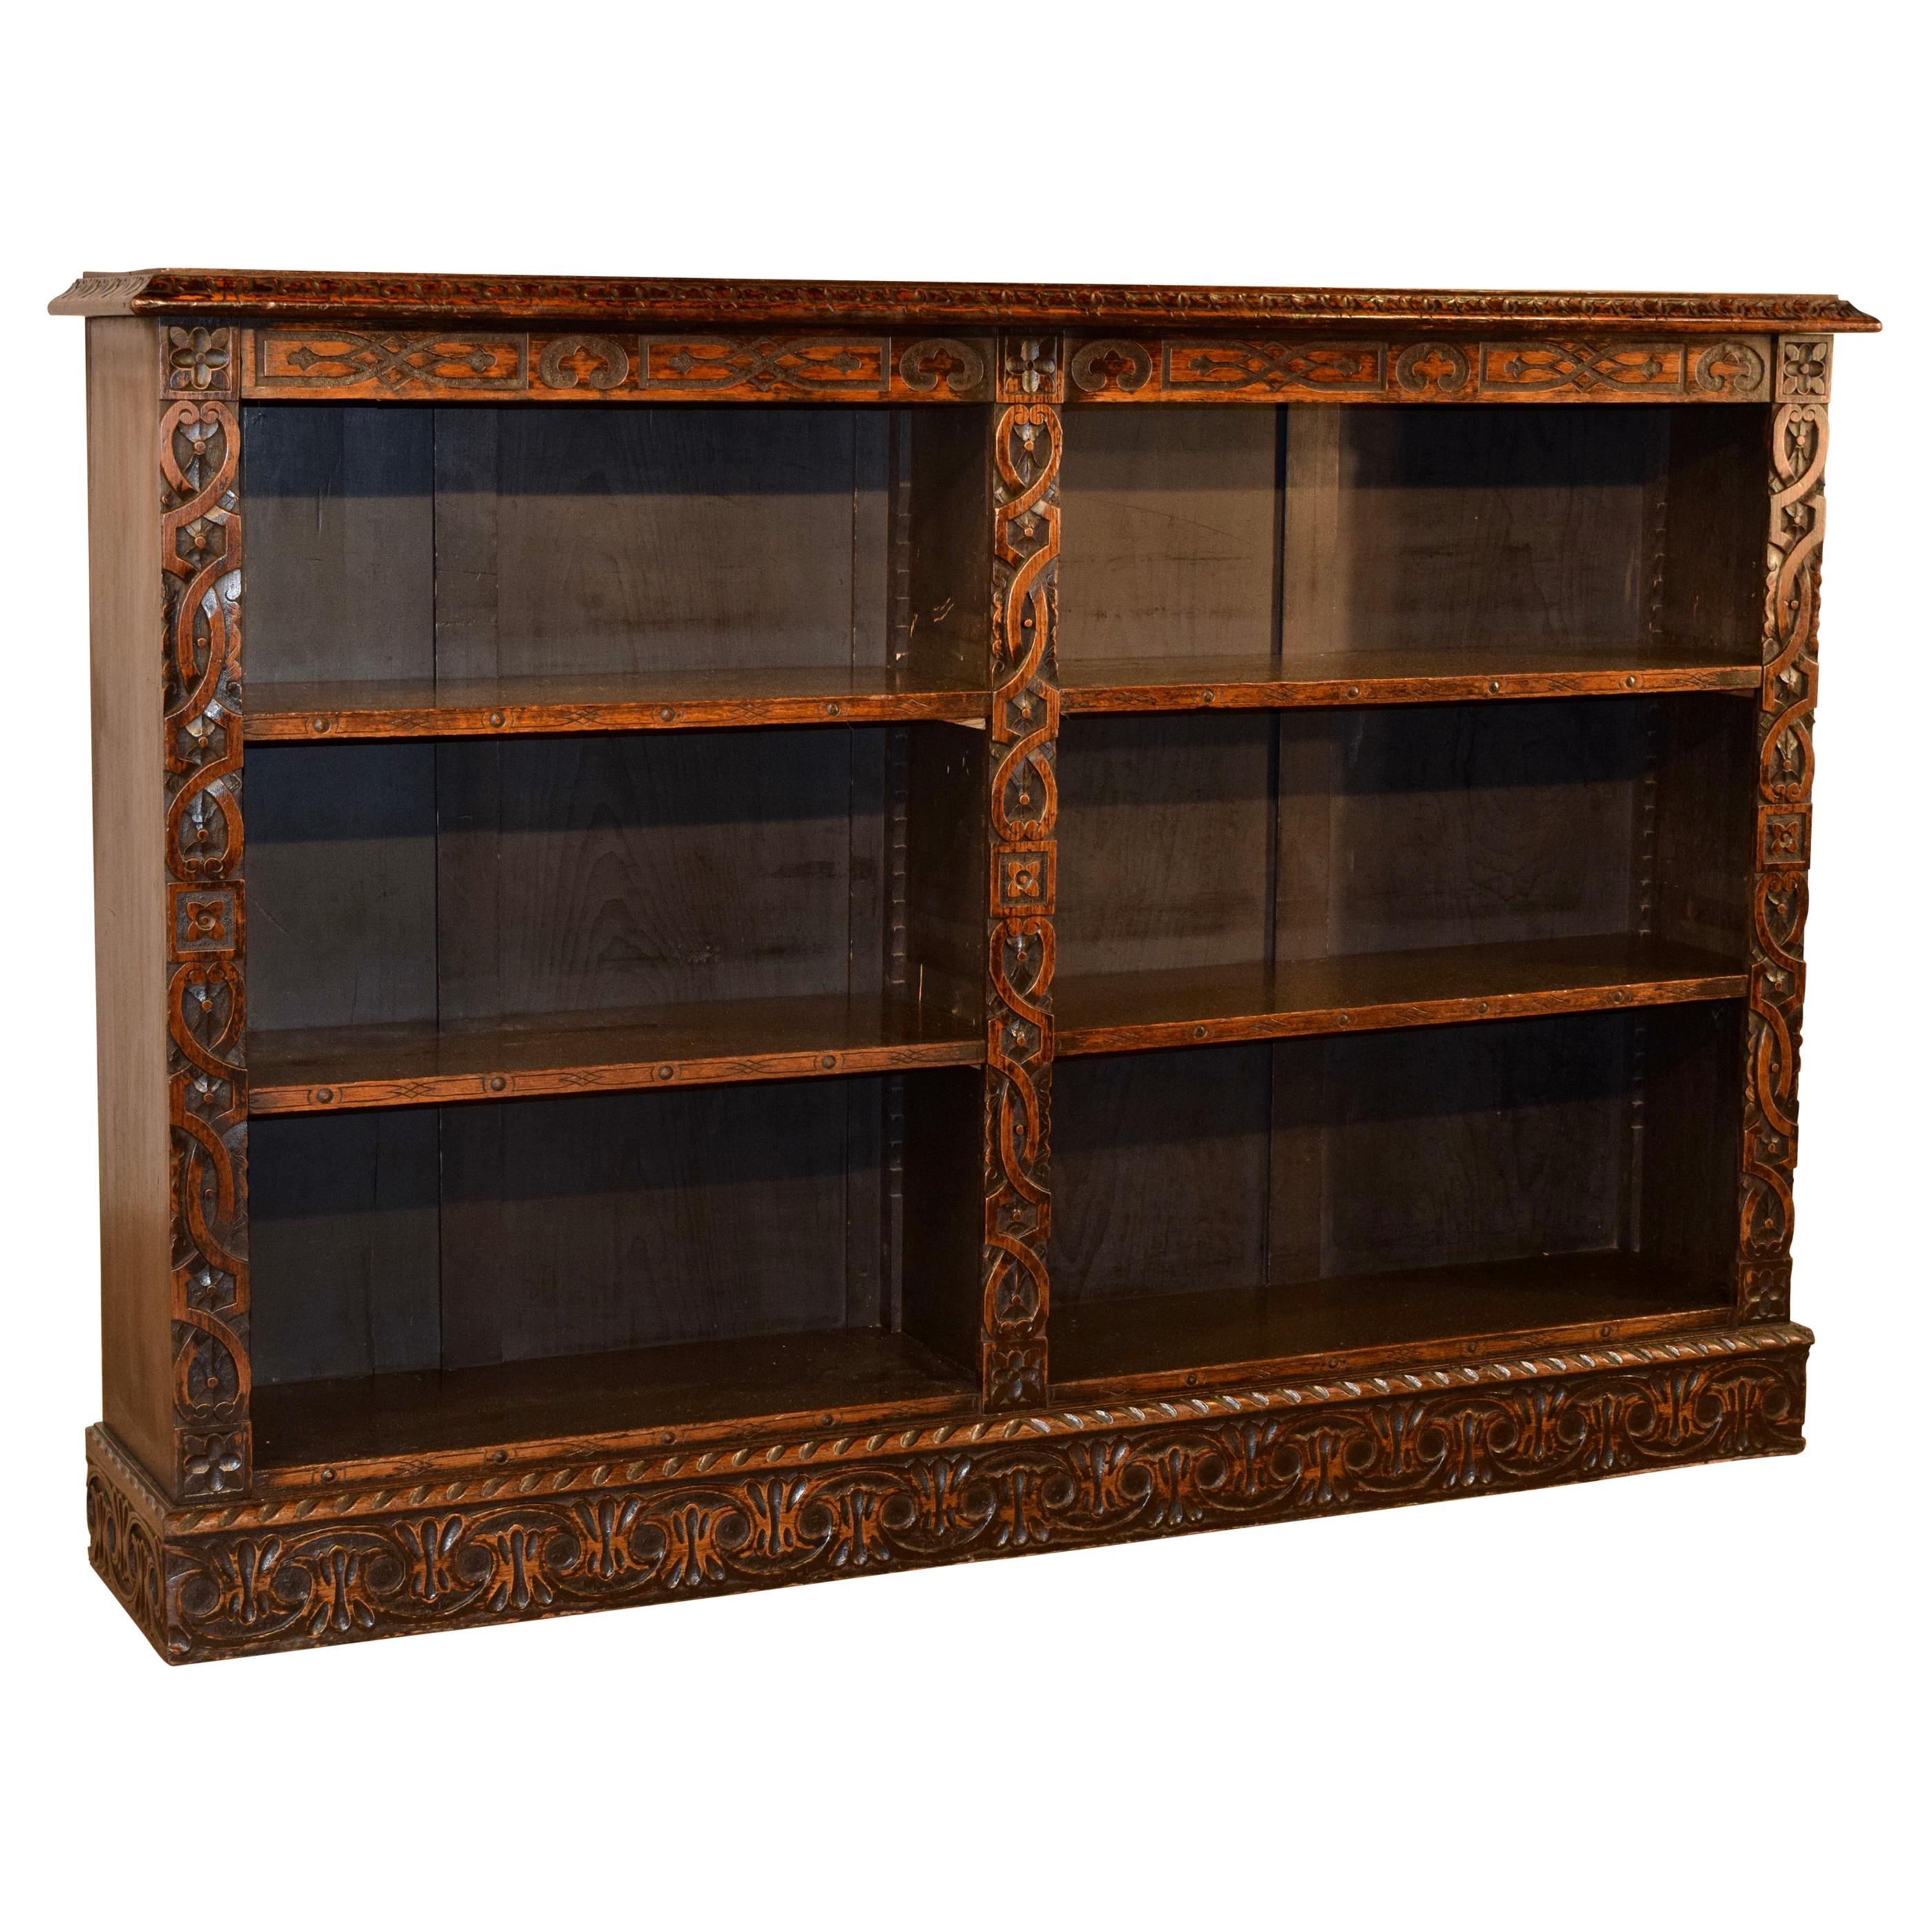 19th Century English Oak Bookcase